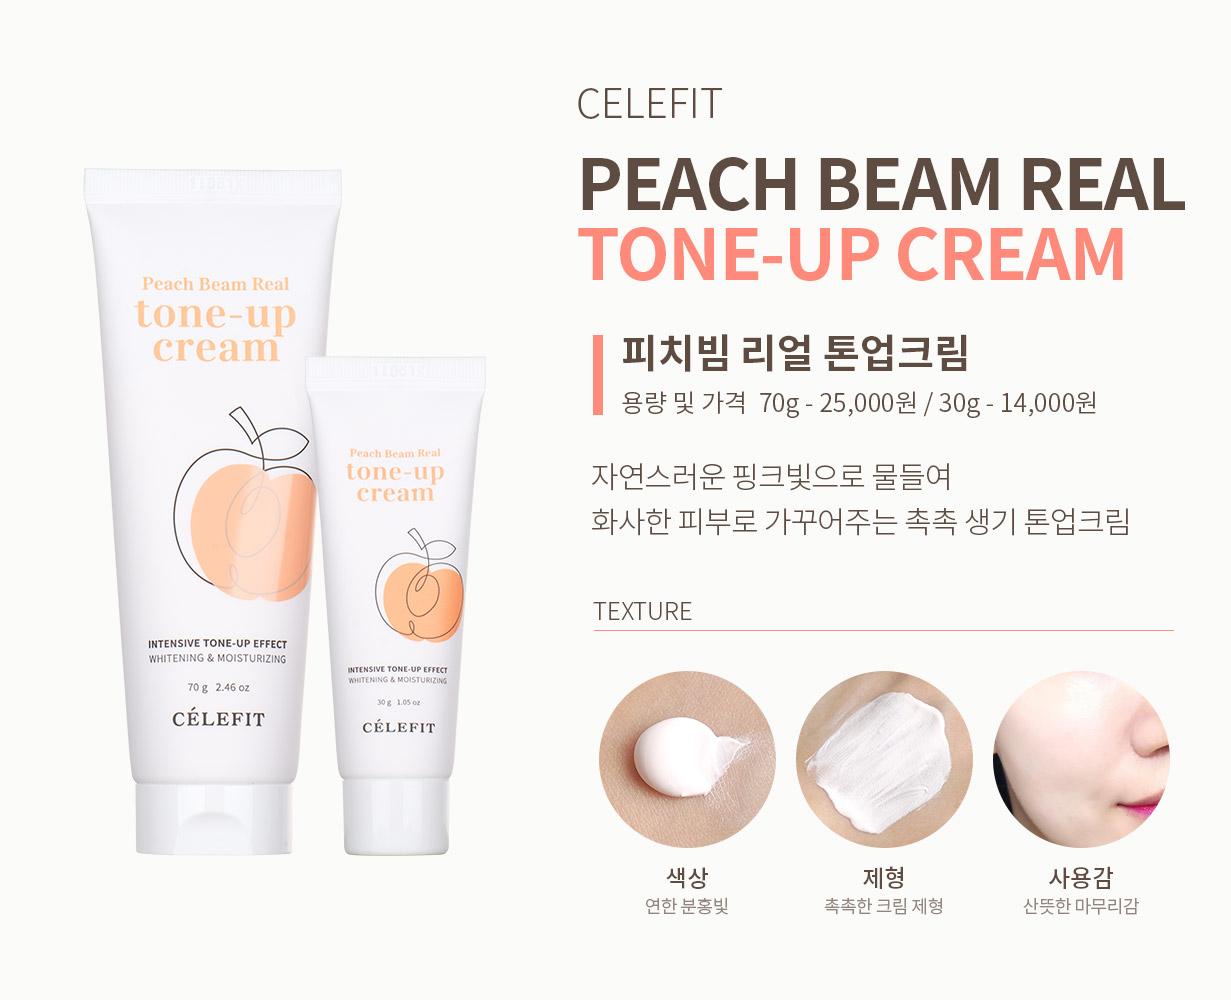 Kem Dưỡng Trắng Da Célefit Peach Beam Real Tone-up Cream